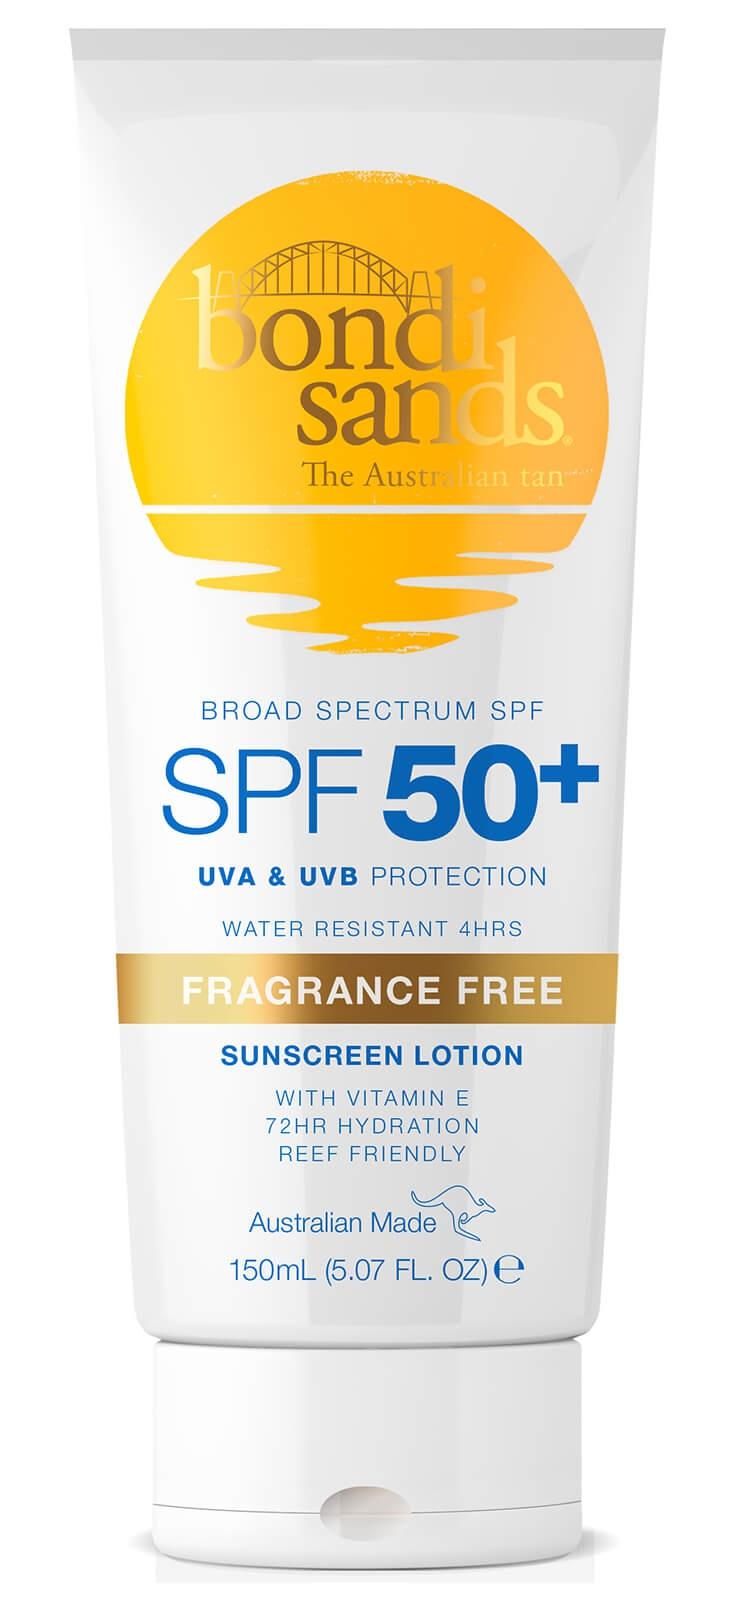 Bondi Sands Sunscreen Lotion Spf50+ - Fragrance Free